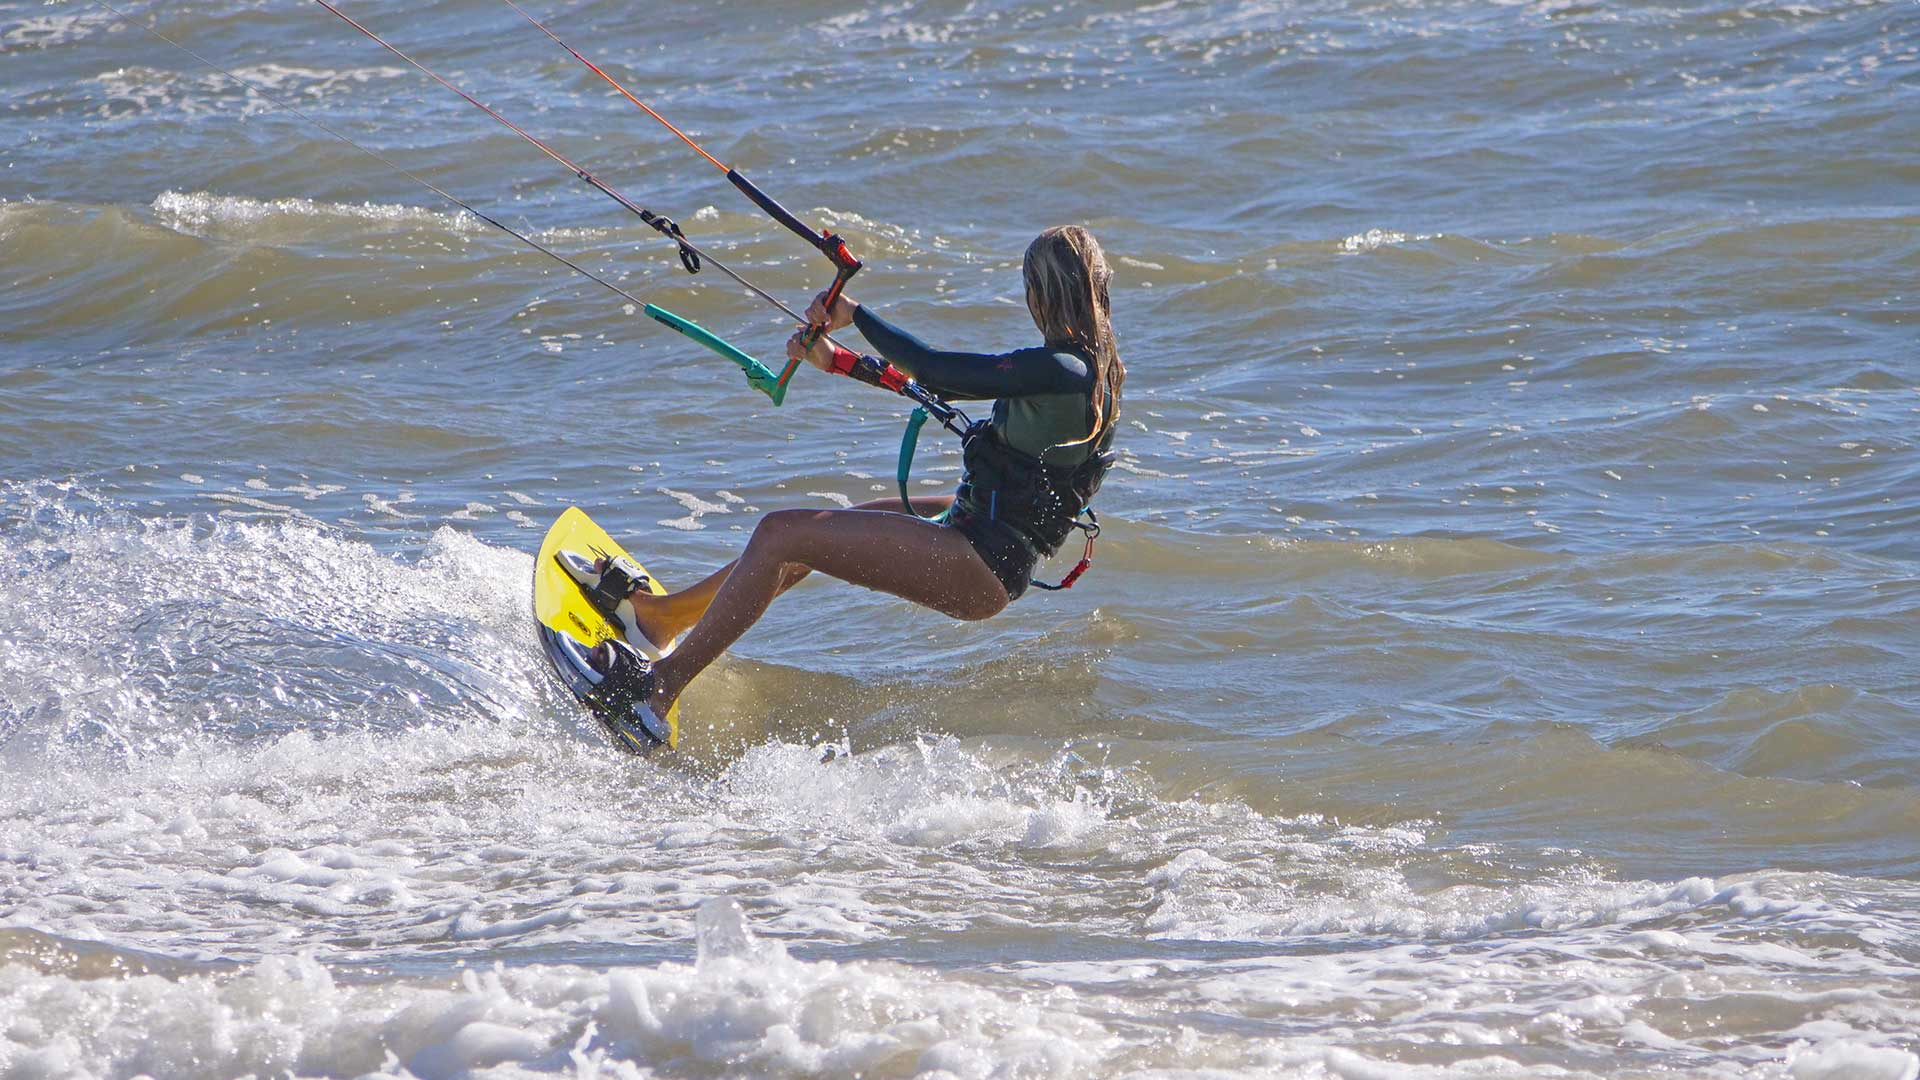 latina-foce-verde-kite-surf-01